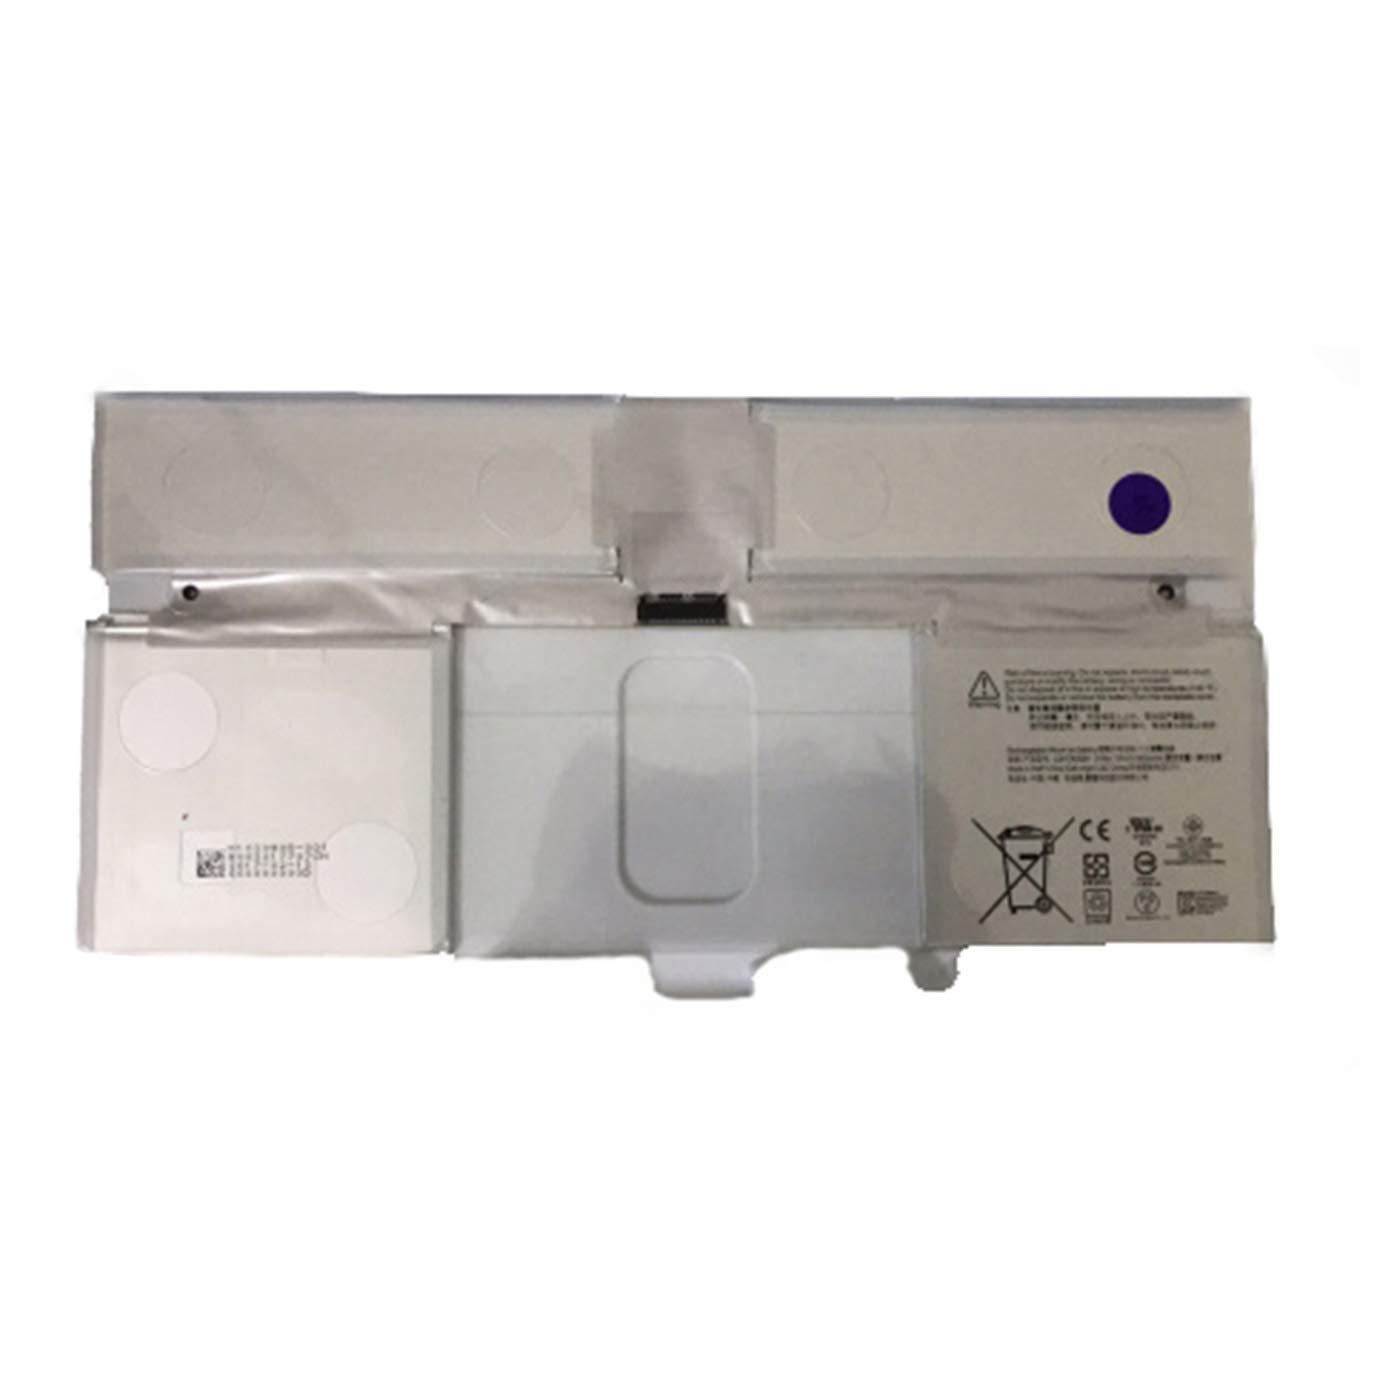 BOWEIRUI G3HTA042H (7.5V 6800mAh) Tablet Battery Replacement for Microsoft Surface Book G3HTA042H Series G3HTA042H